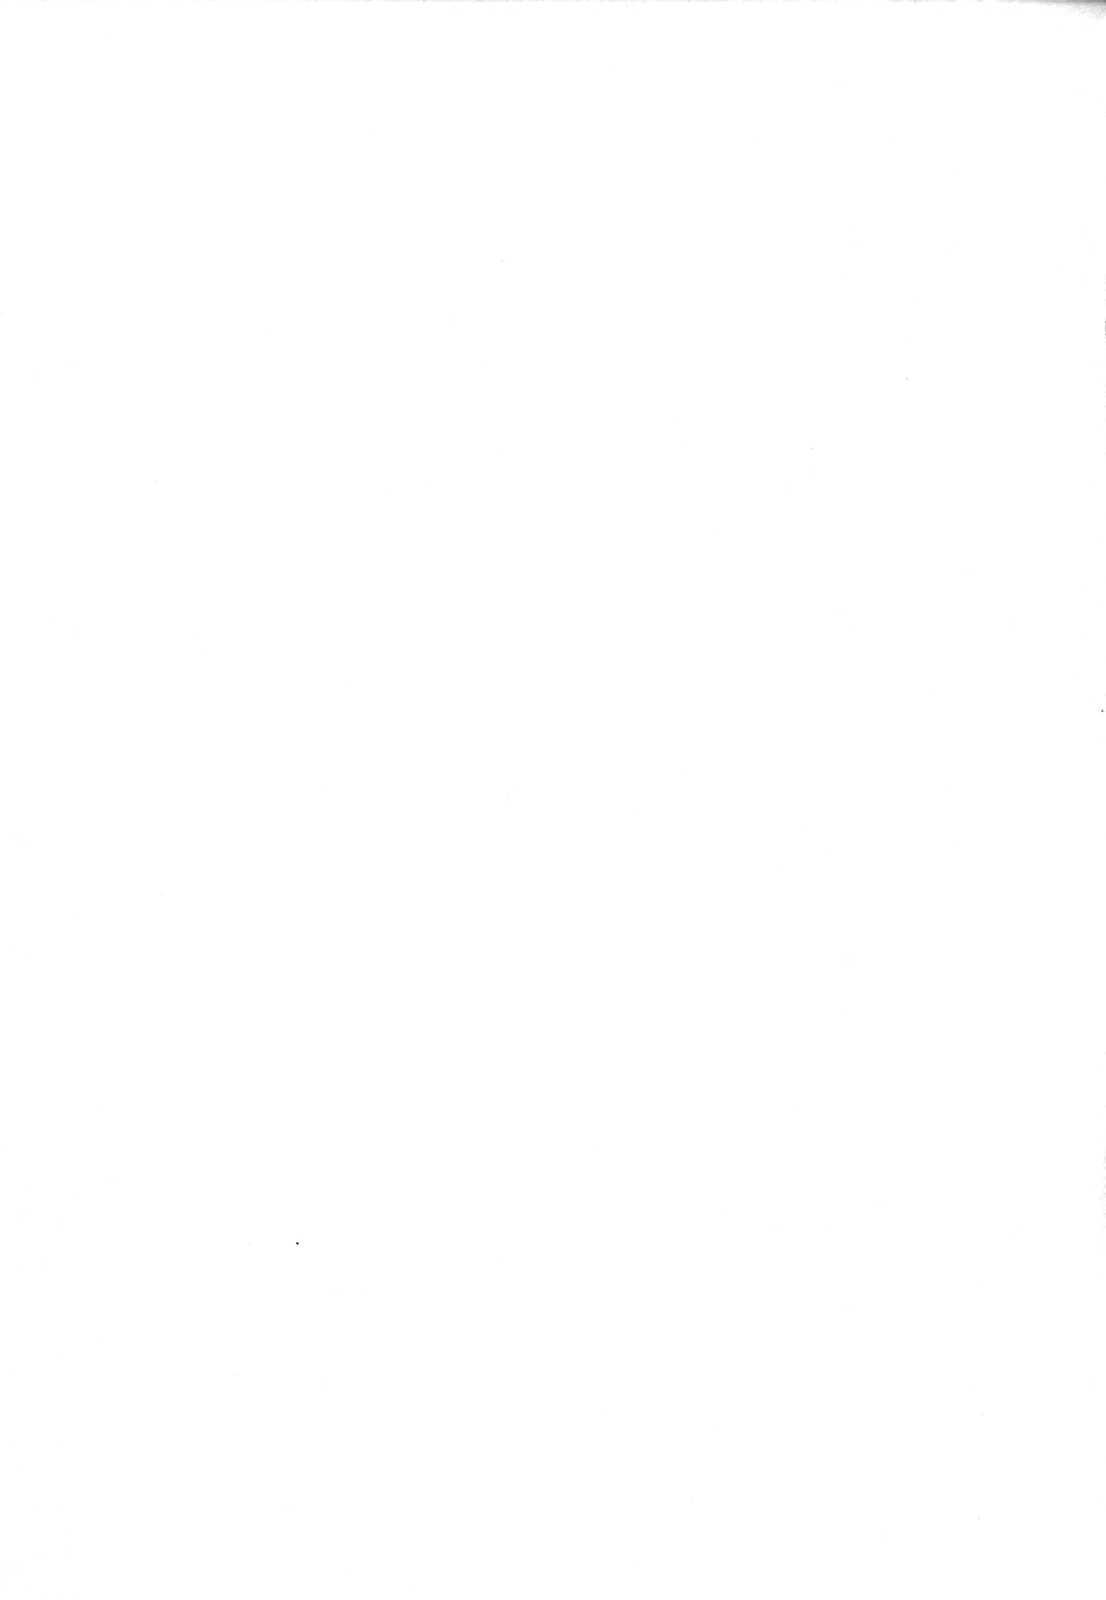 [LEE] Totsugeki Tonari no Onii-chan Ch. 1-7 [ENG] 4